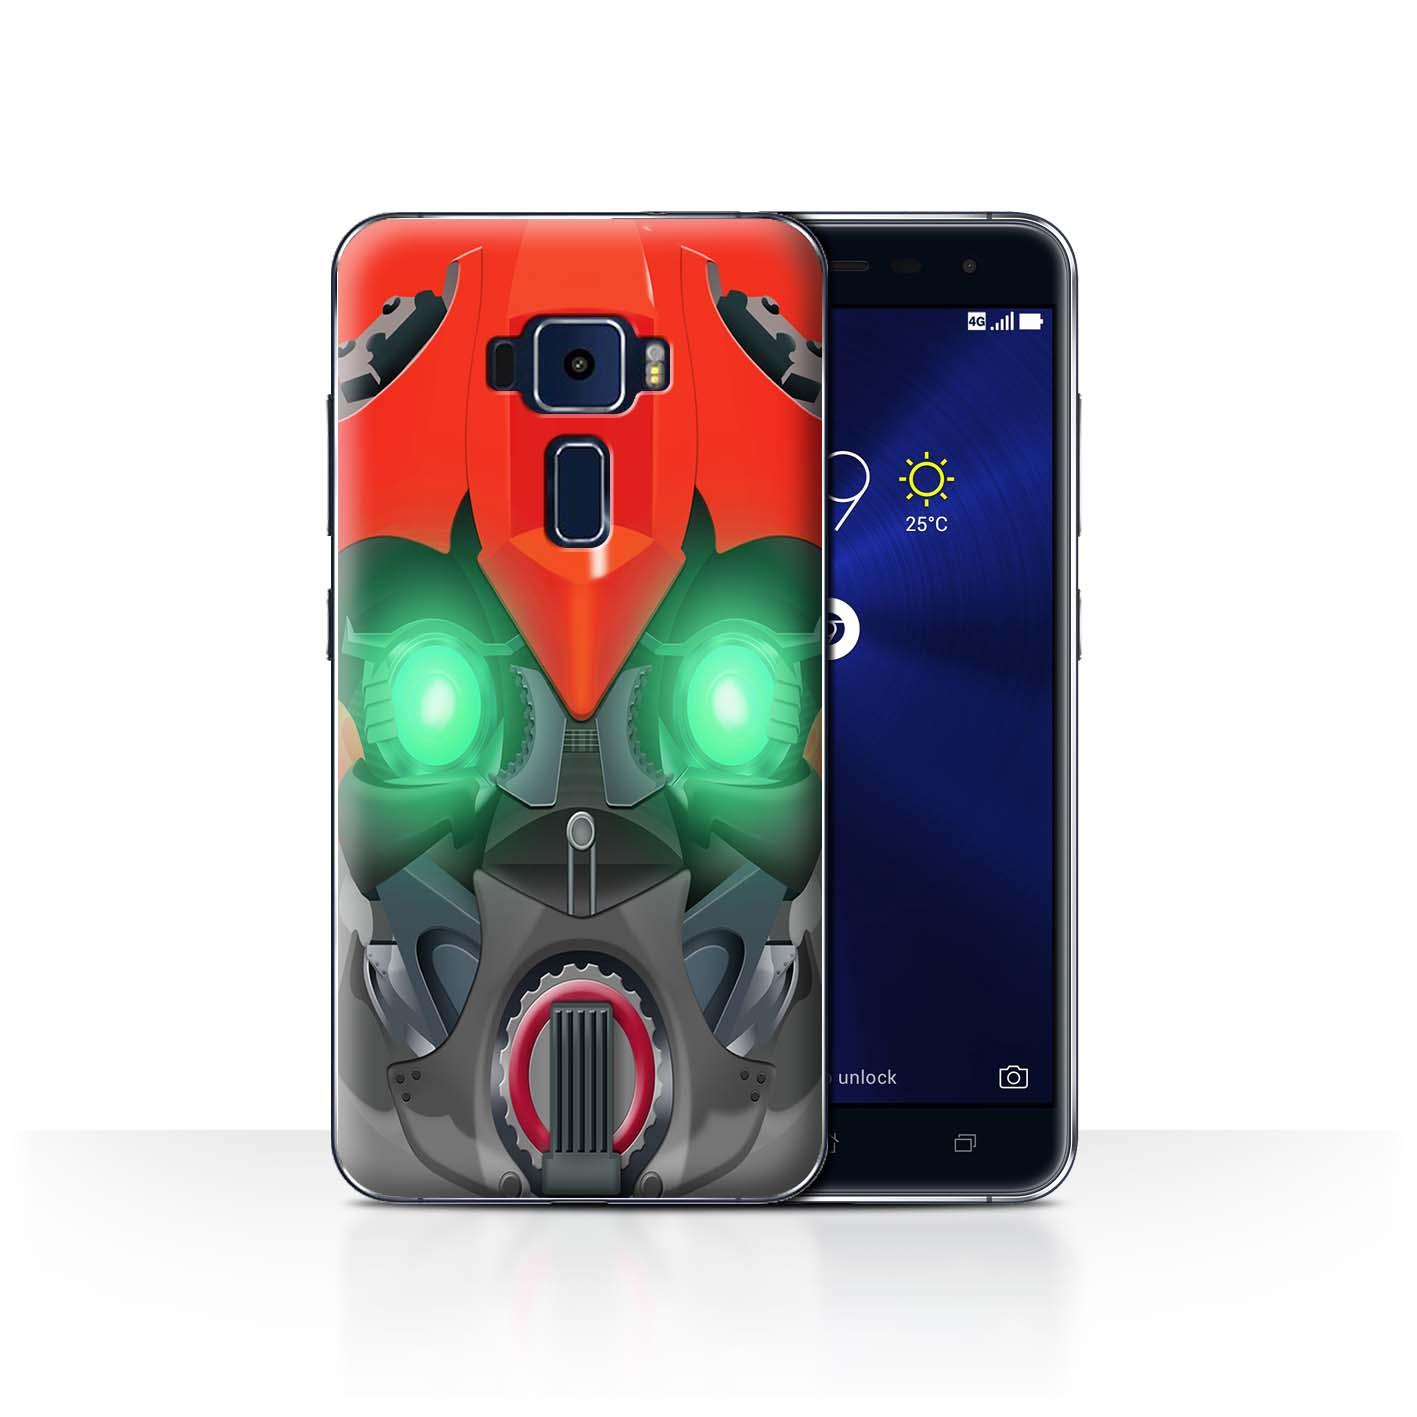 STUFF4-Back-Case-Cover-Skin-for-Asus-Zenfone-3-ZE552KL-Robots